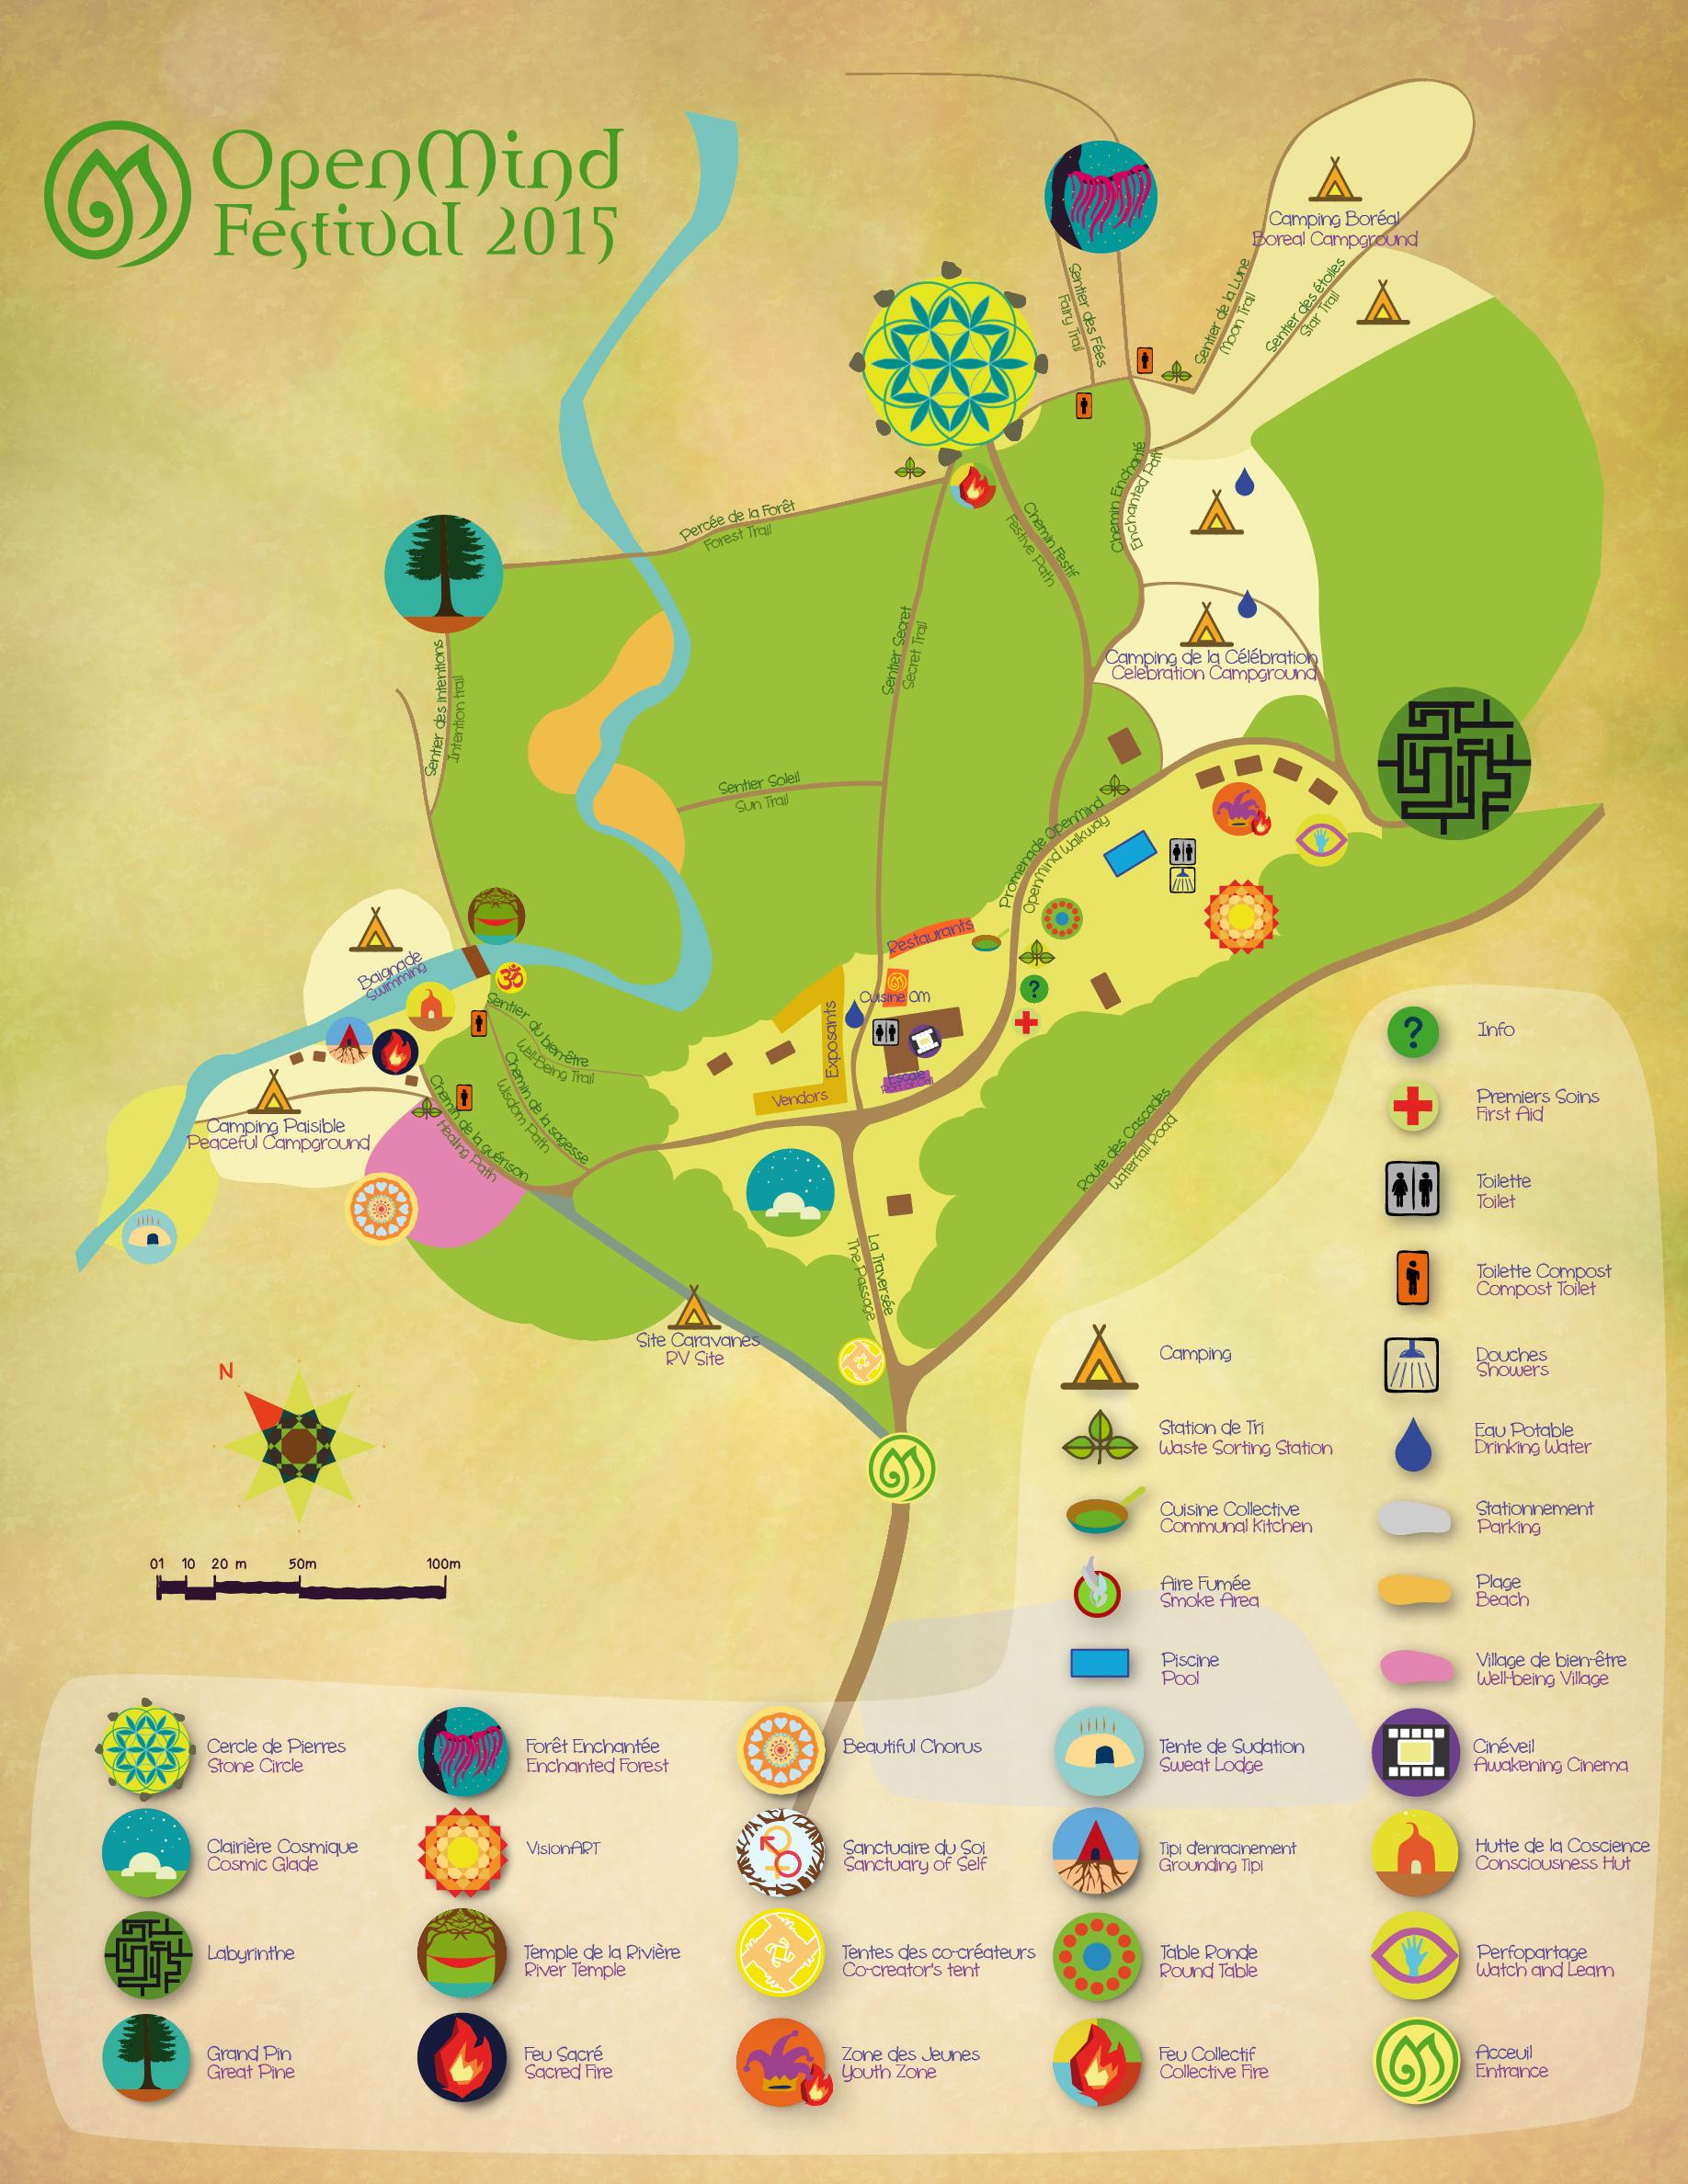 Open Mind Festival Site Map 2015